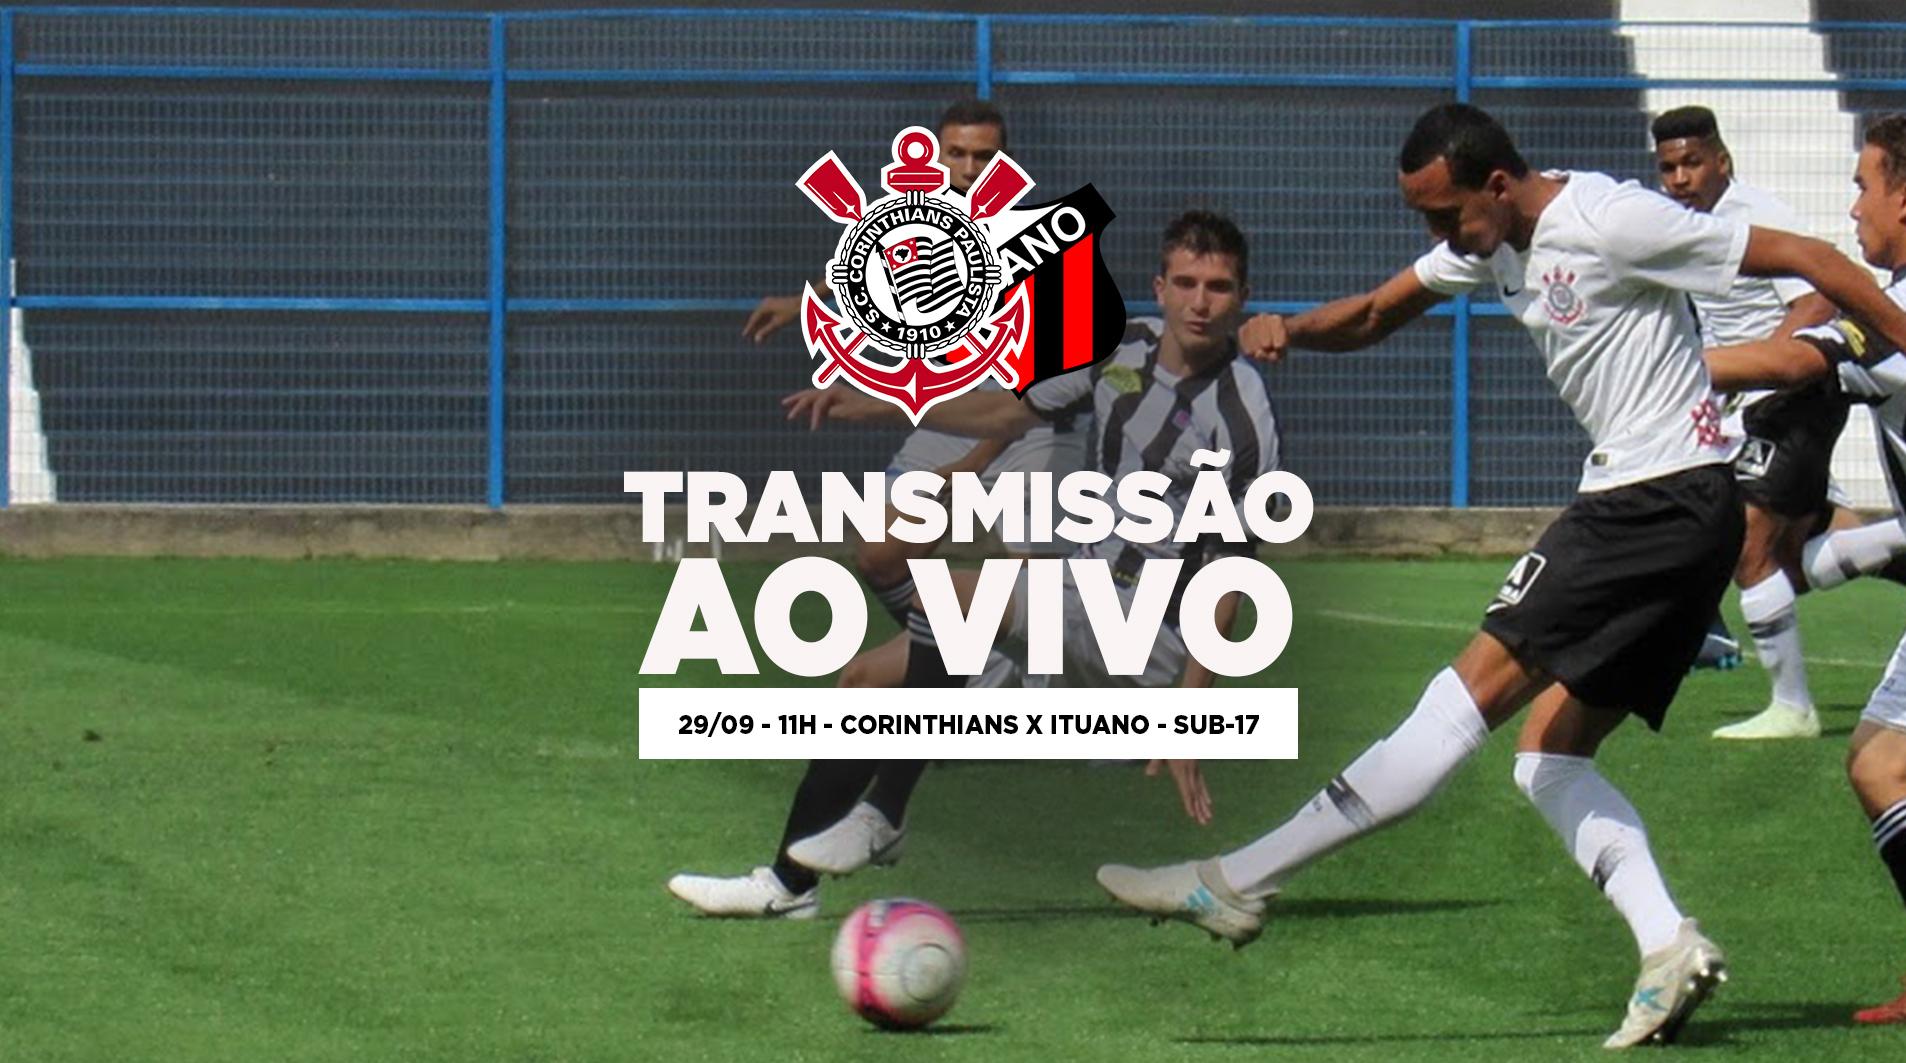 Corinthians x Ituano - Paulistão Sub-17 2018